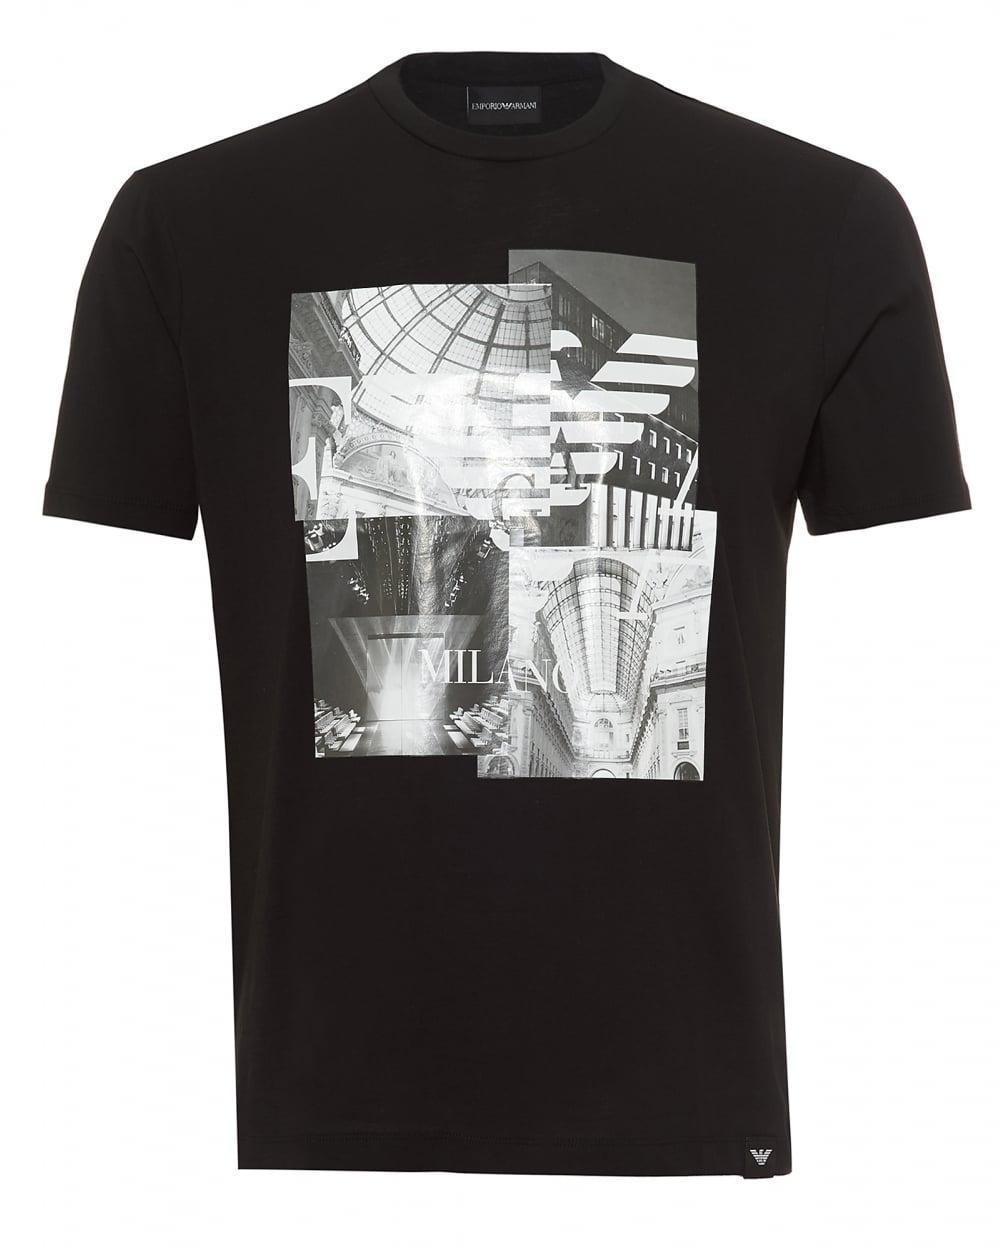 2c6323b0 Emporio Armani Mens Milano Print T-Shirt, Regular Fit Black Tee